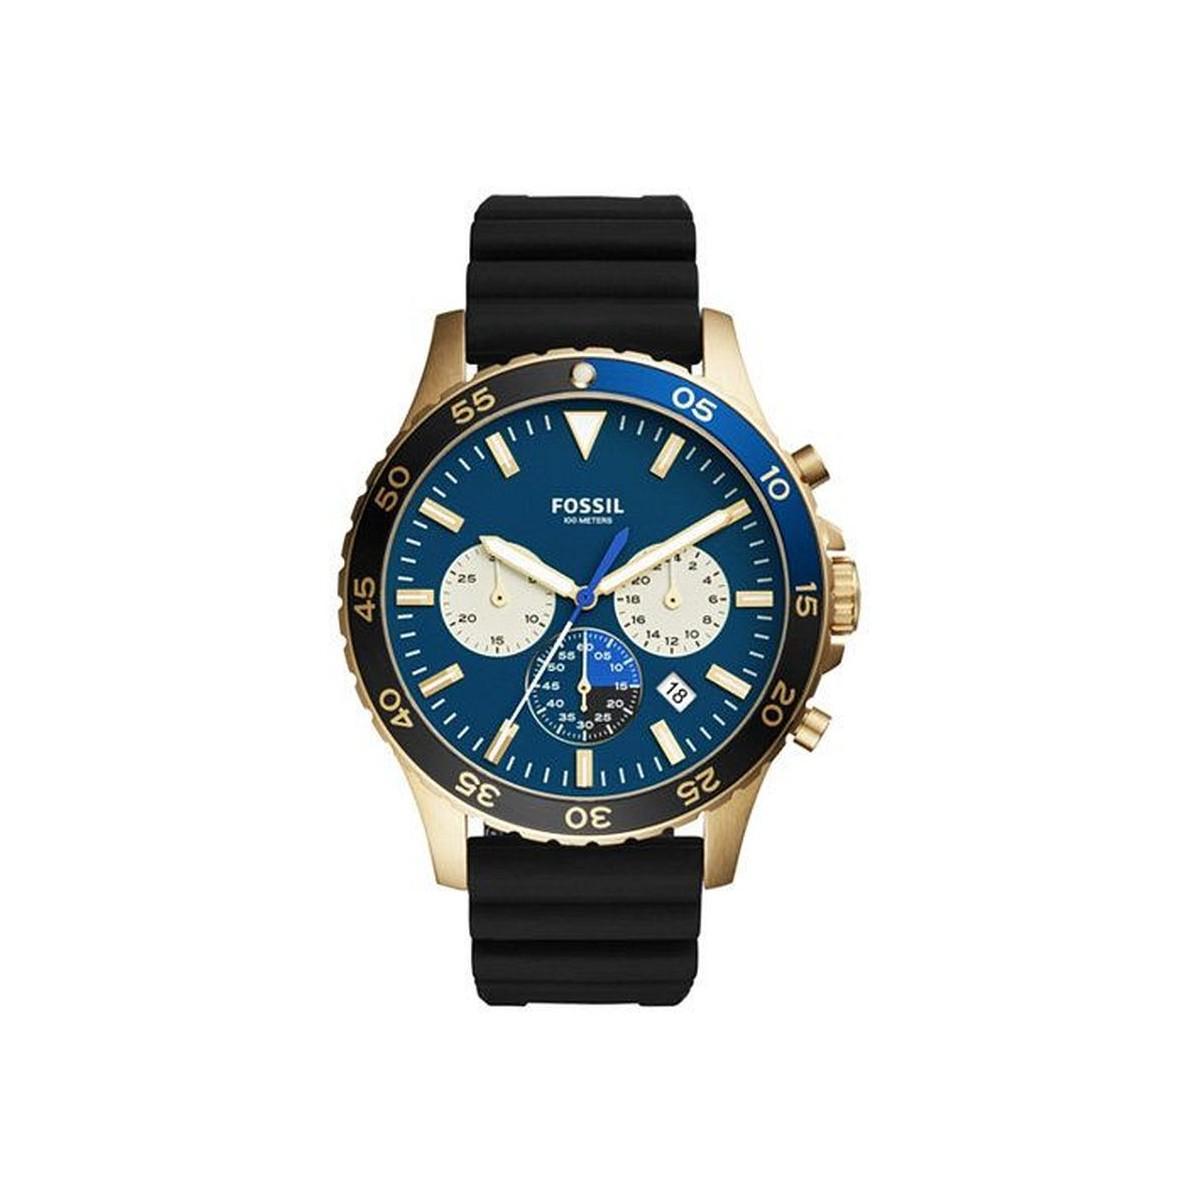 https://www.gaberjoyeria.com/4188-thickbox_default/reloj-fossil-crewmaster-sport.jpg